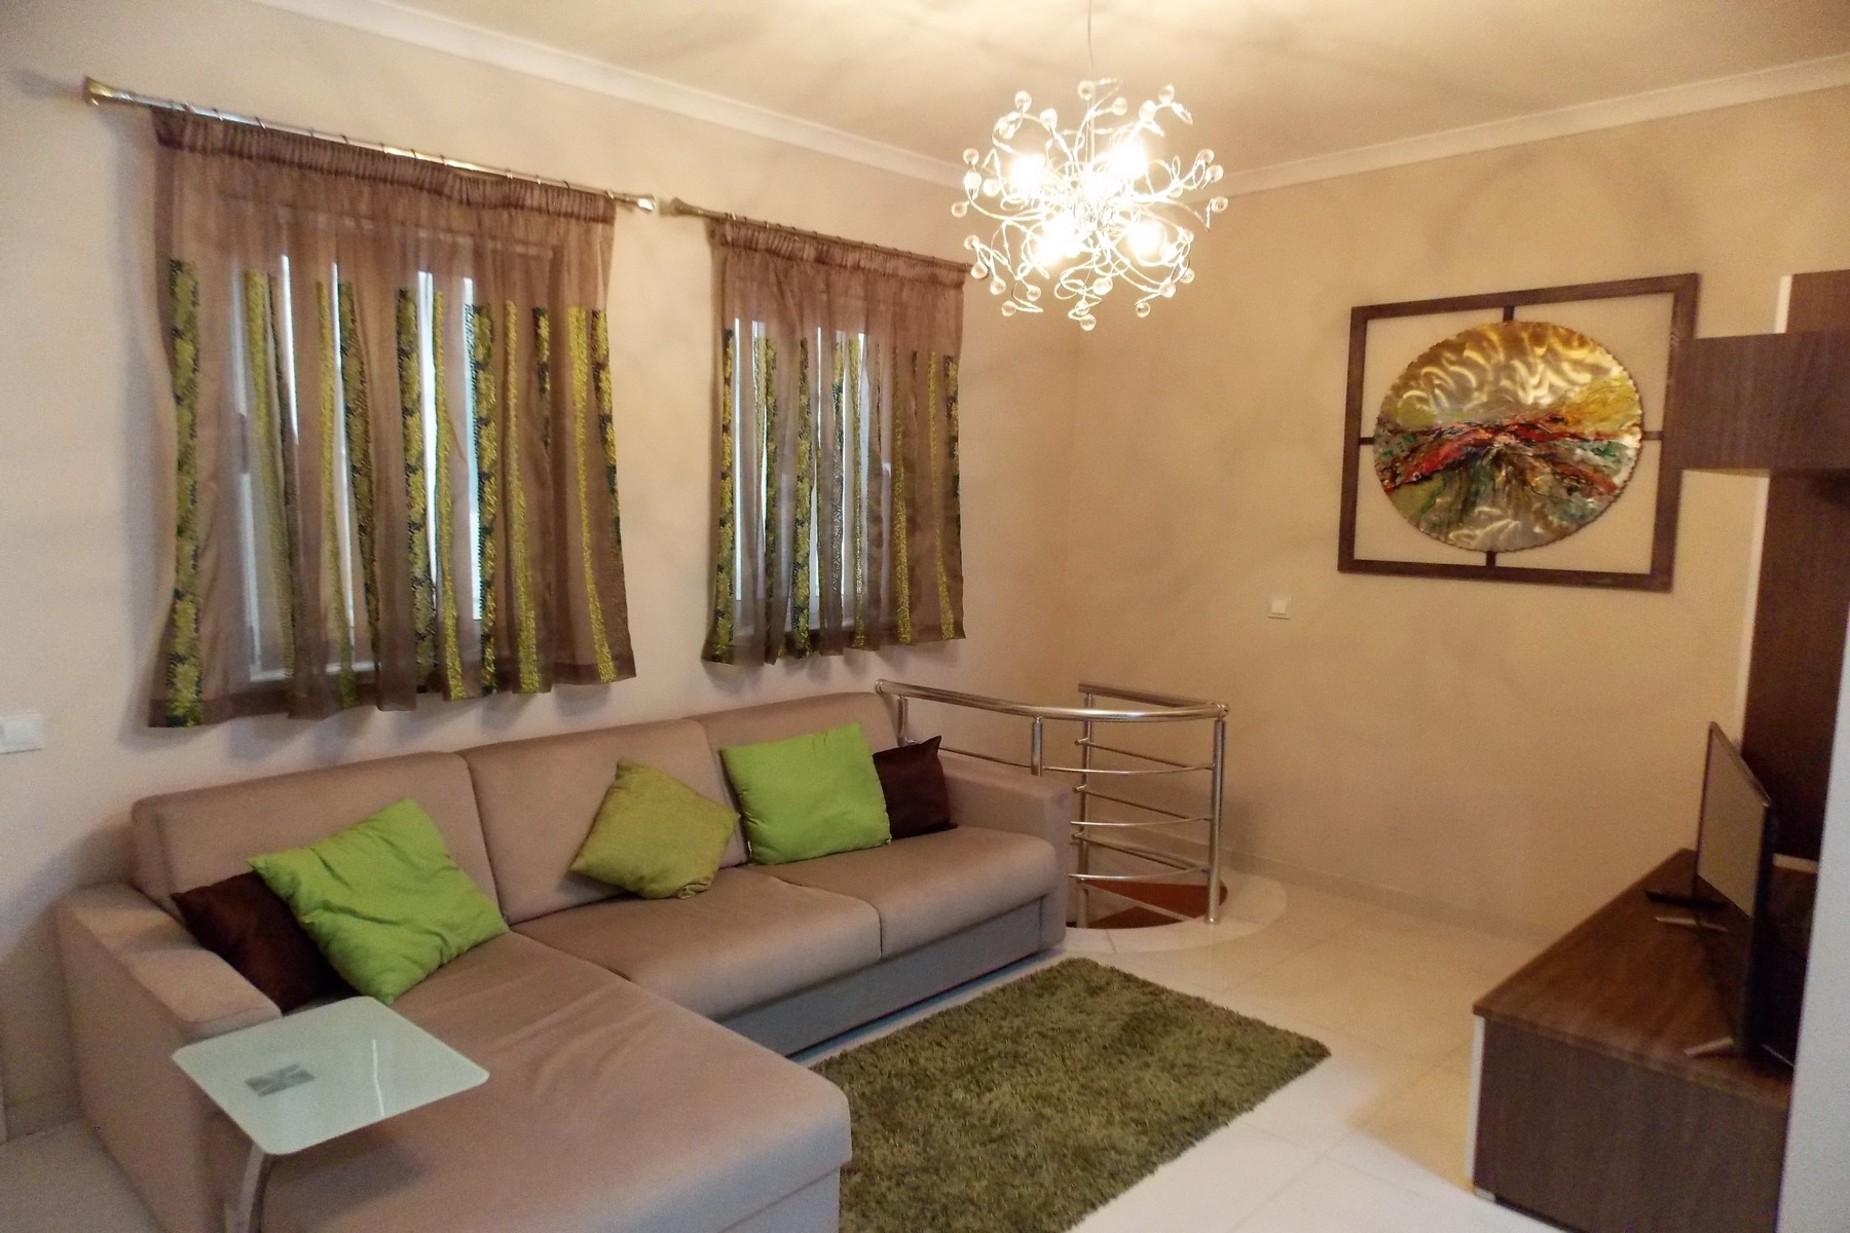 2 bed Terraced House For Rent in Marsascala, Marsascala - thumb 7